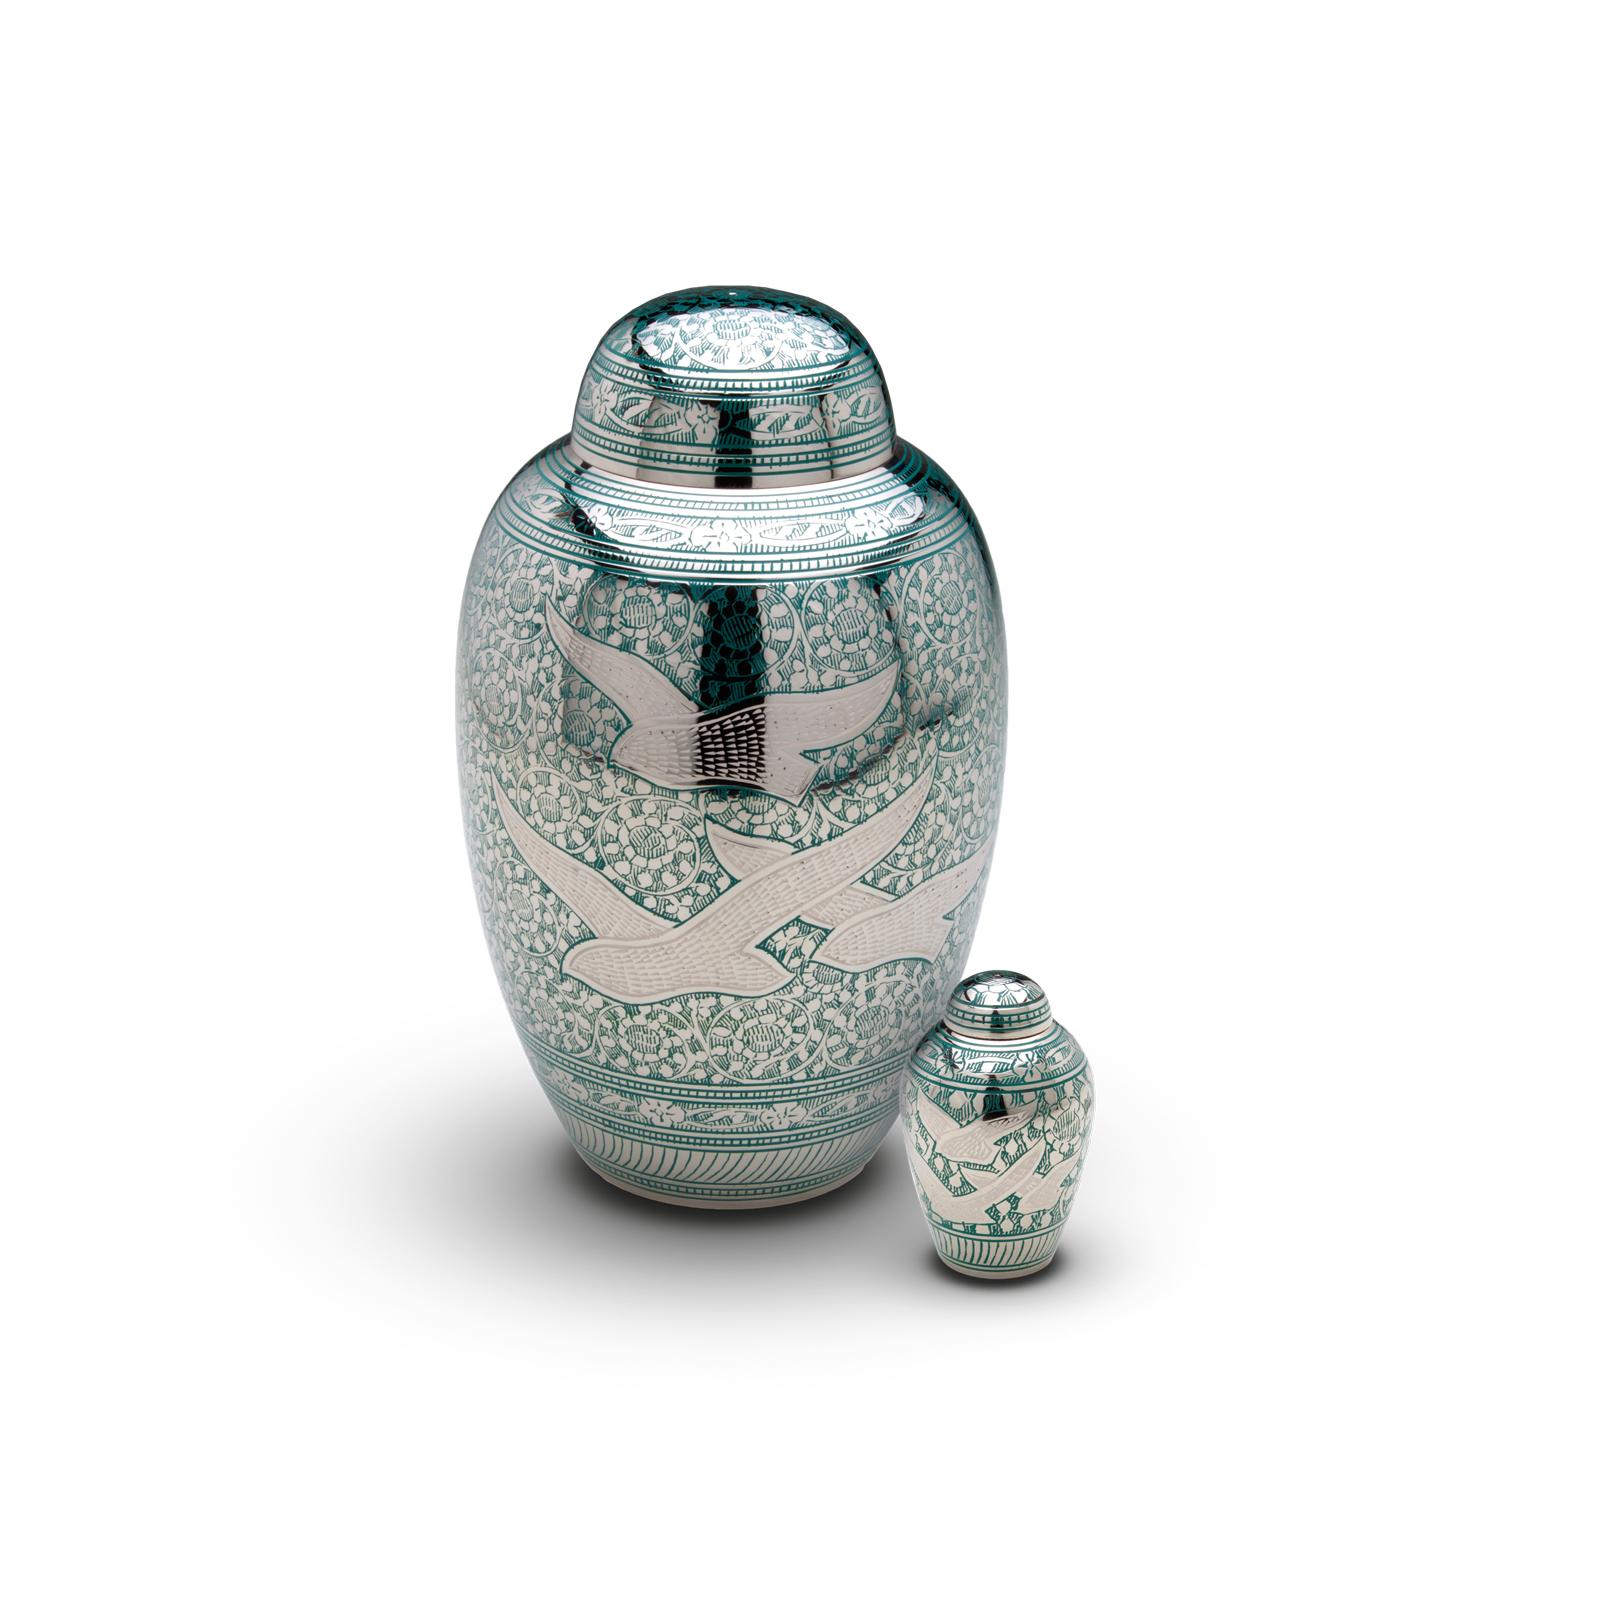 Urna cenizas hu 139 urnas de lat n urnas para cenizas for Los jardines esquelas